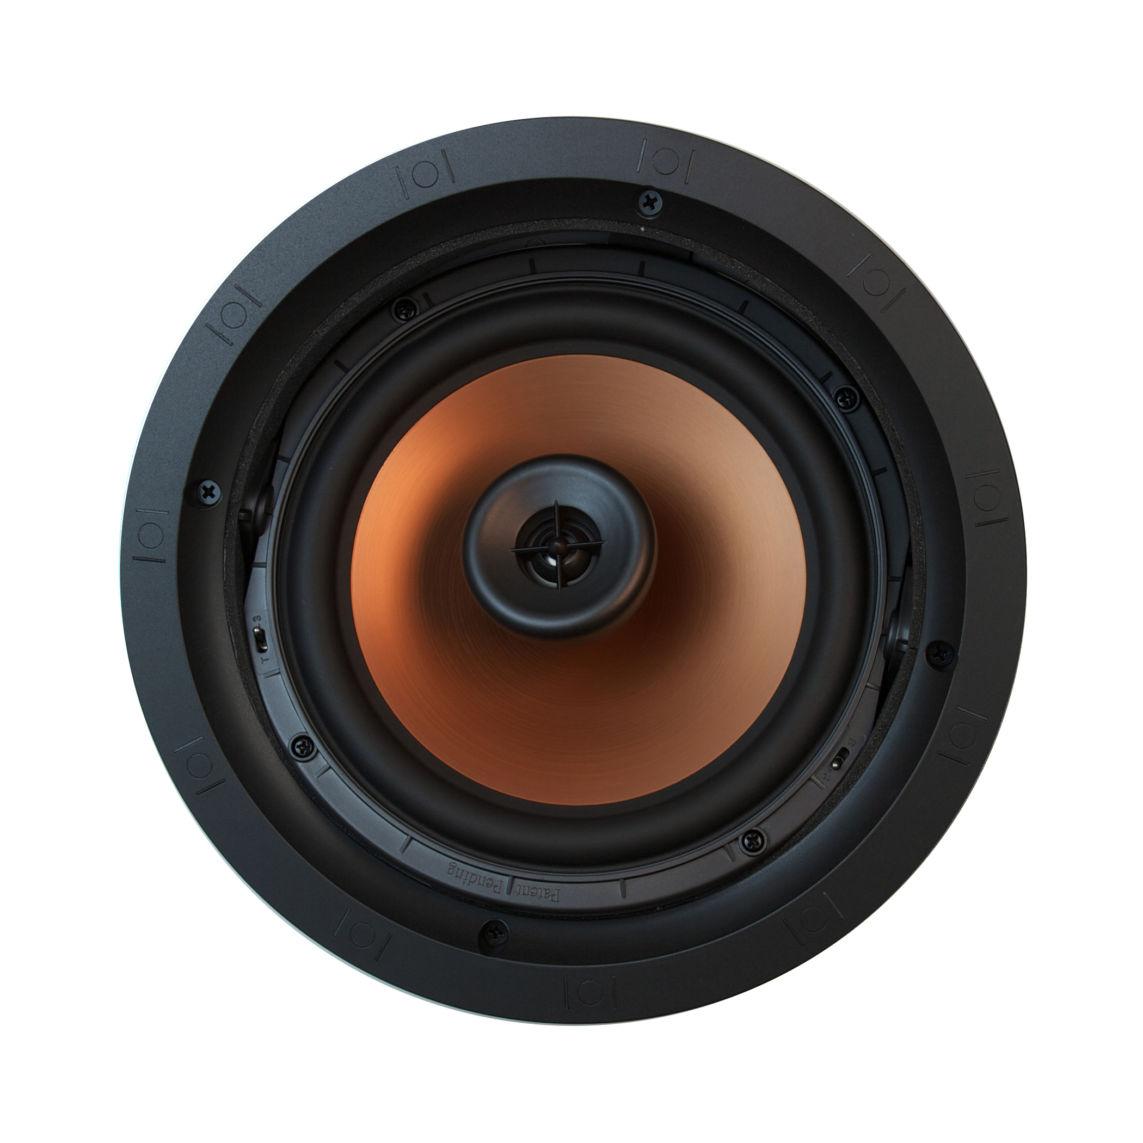 Amazon Klipsch CDT-5800-C II In-Ceiling Speaker - White (Each) Paintable Grill $188.75